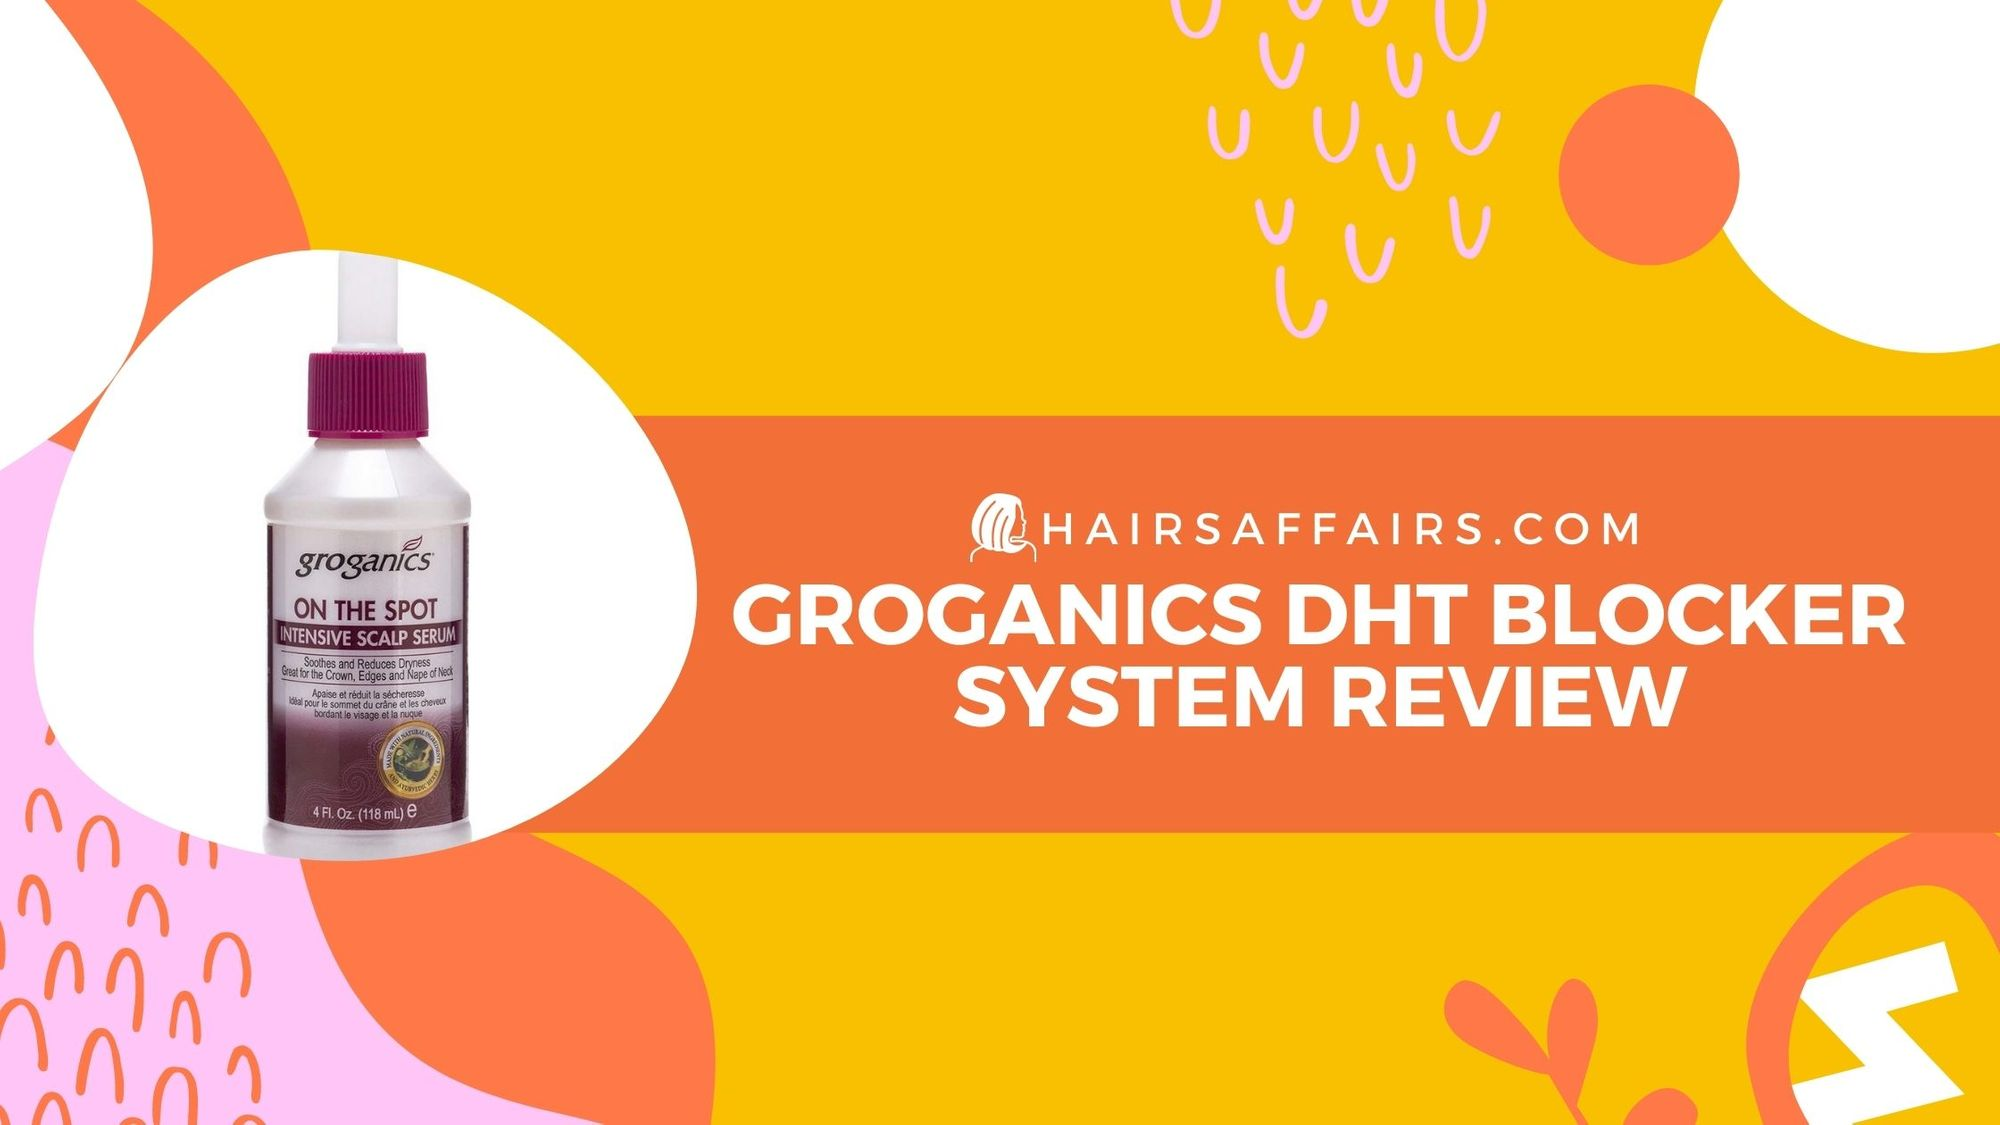 HA-groganics-dht-blocker-system-review